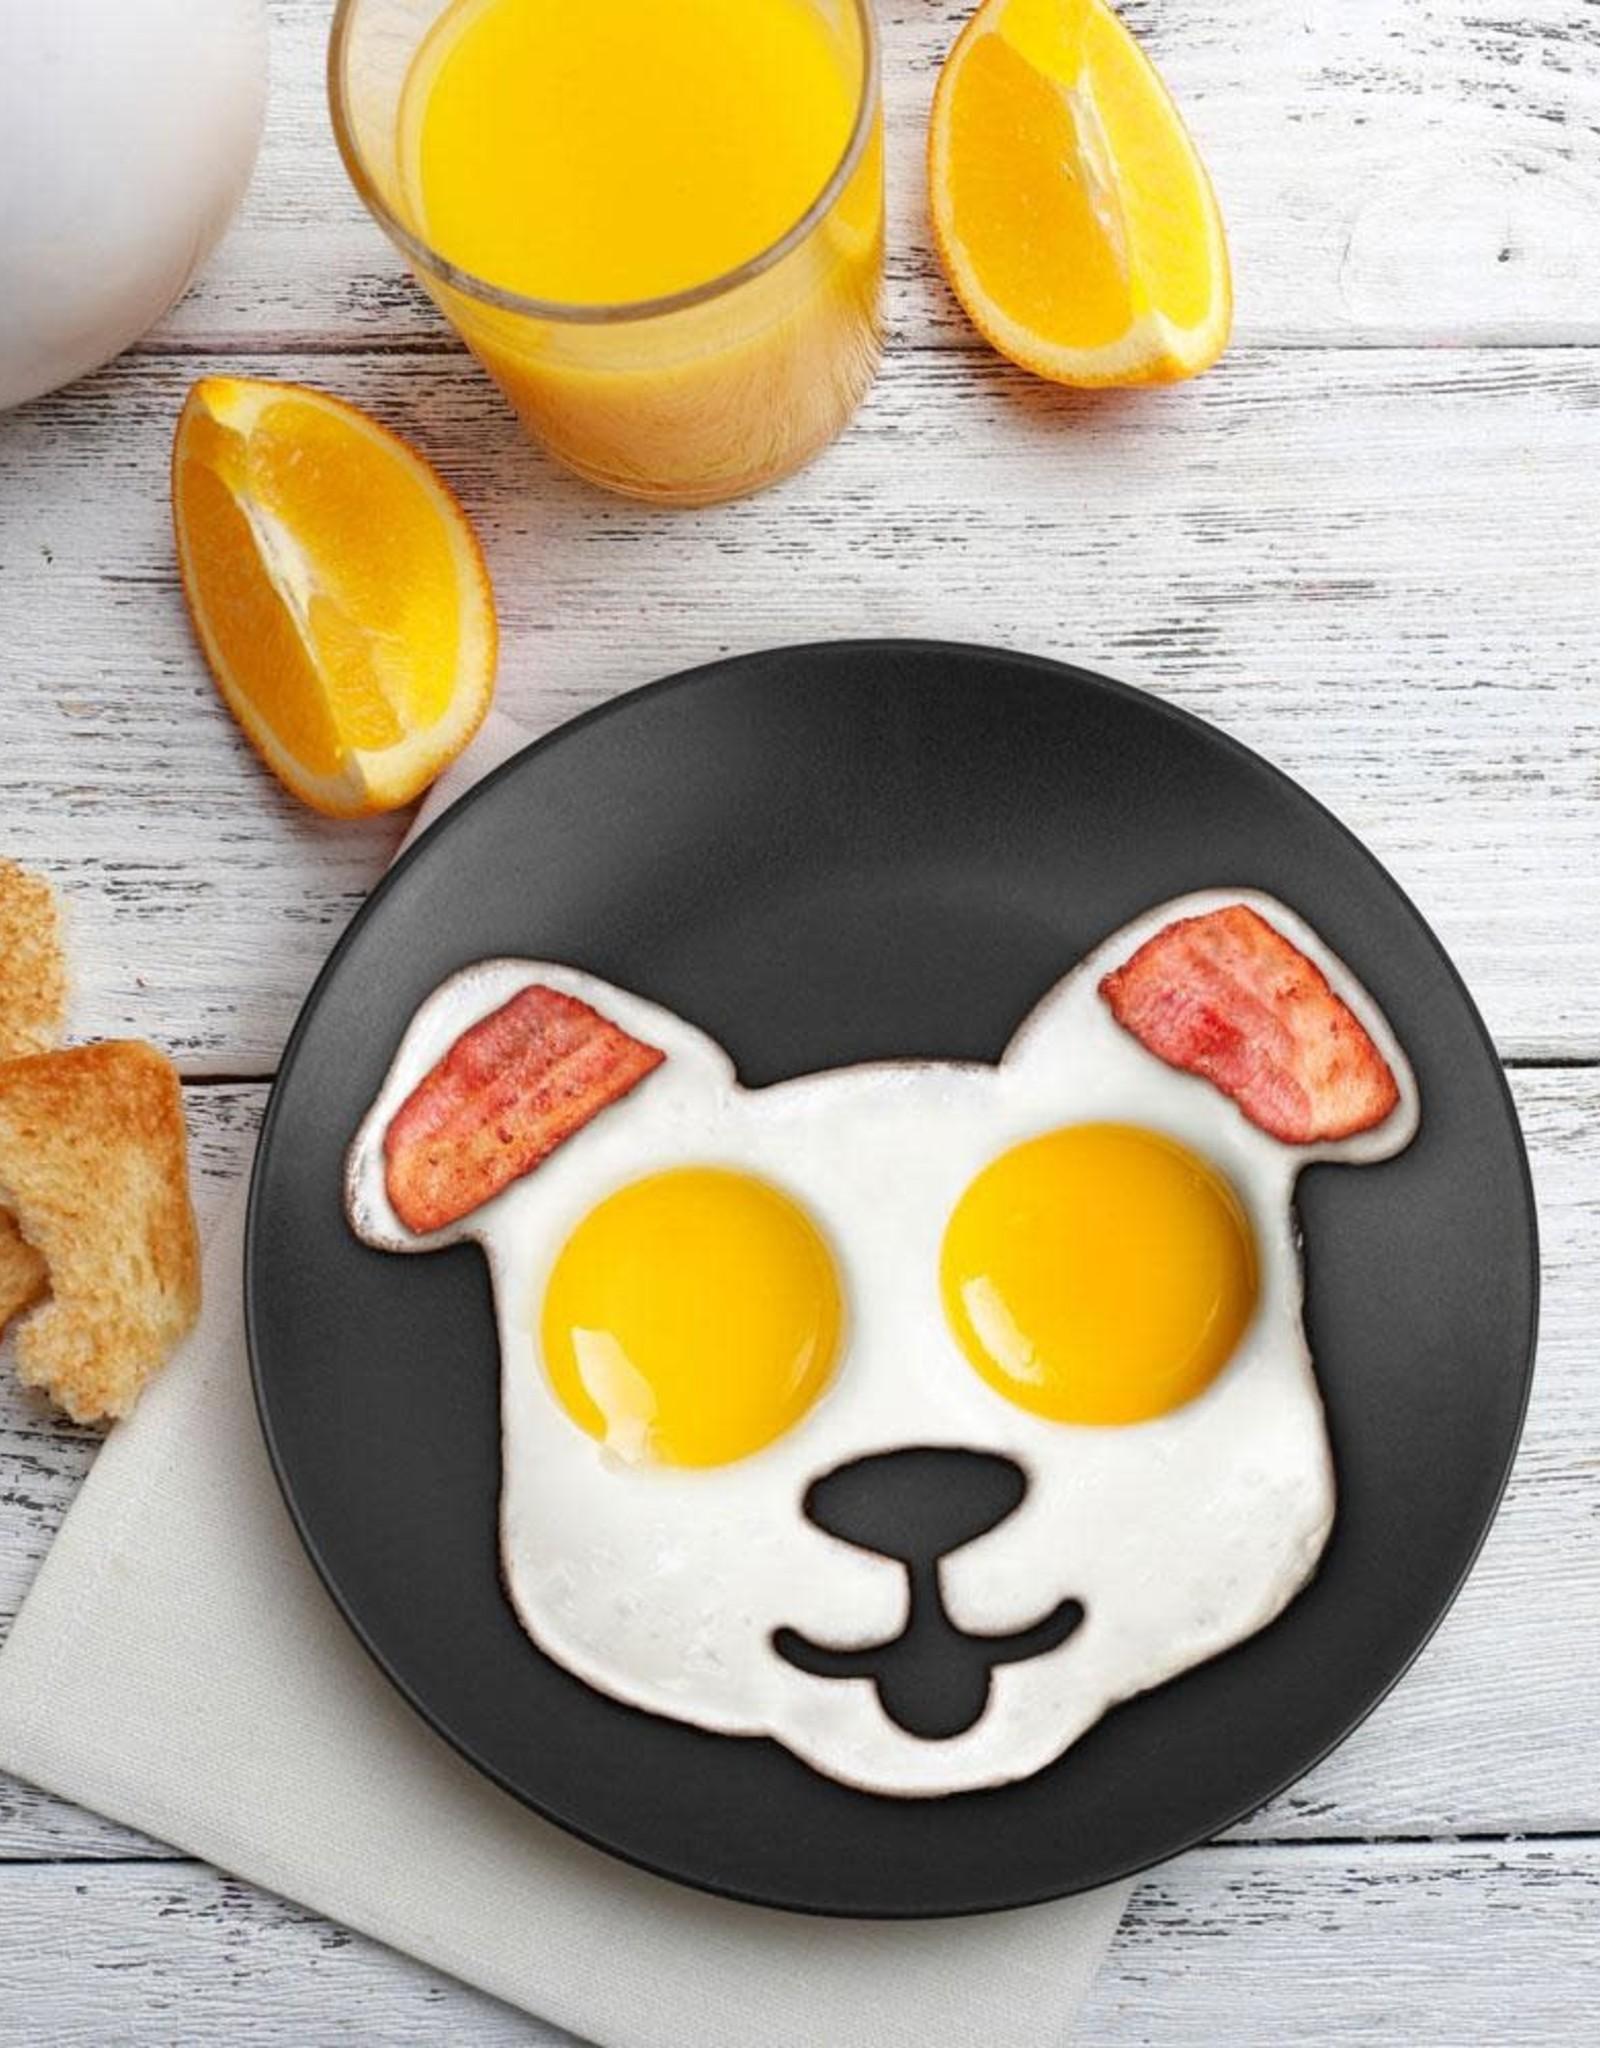 Fred & Friends Funny Side Up - Dog Egg Mold